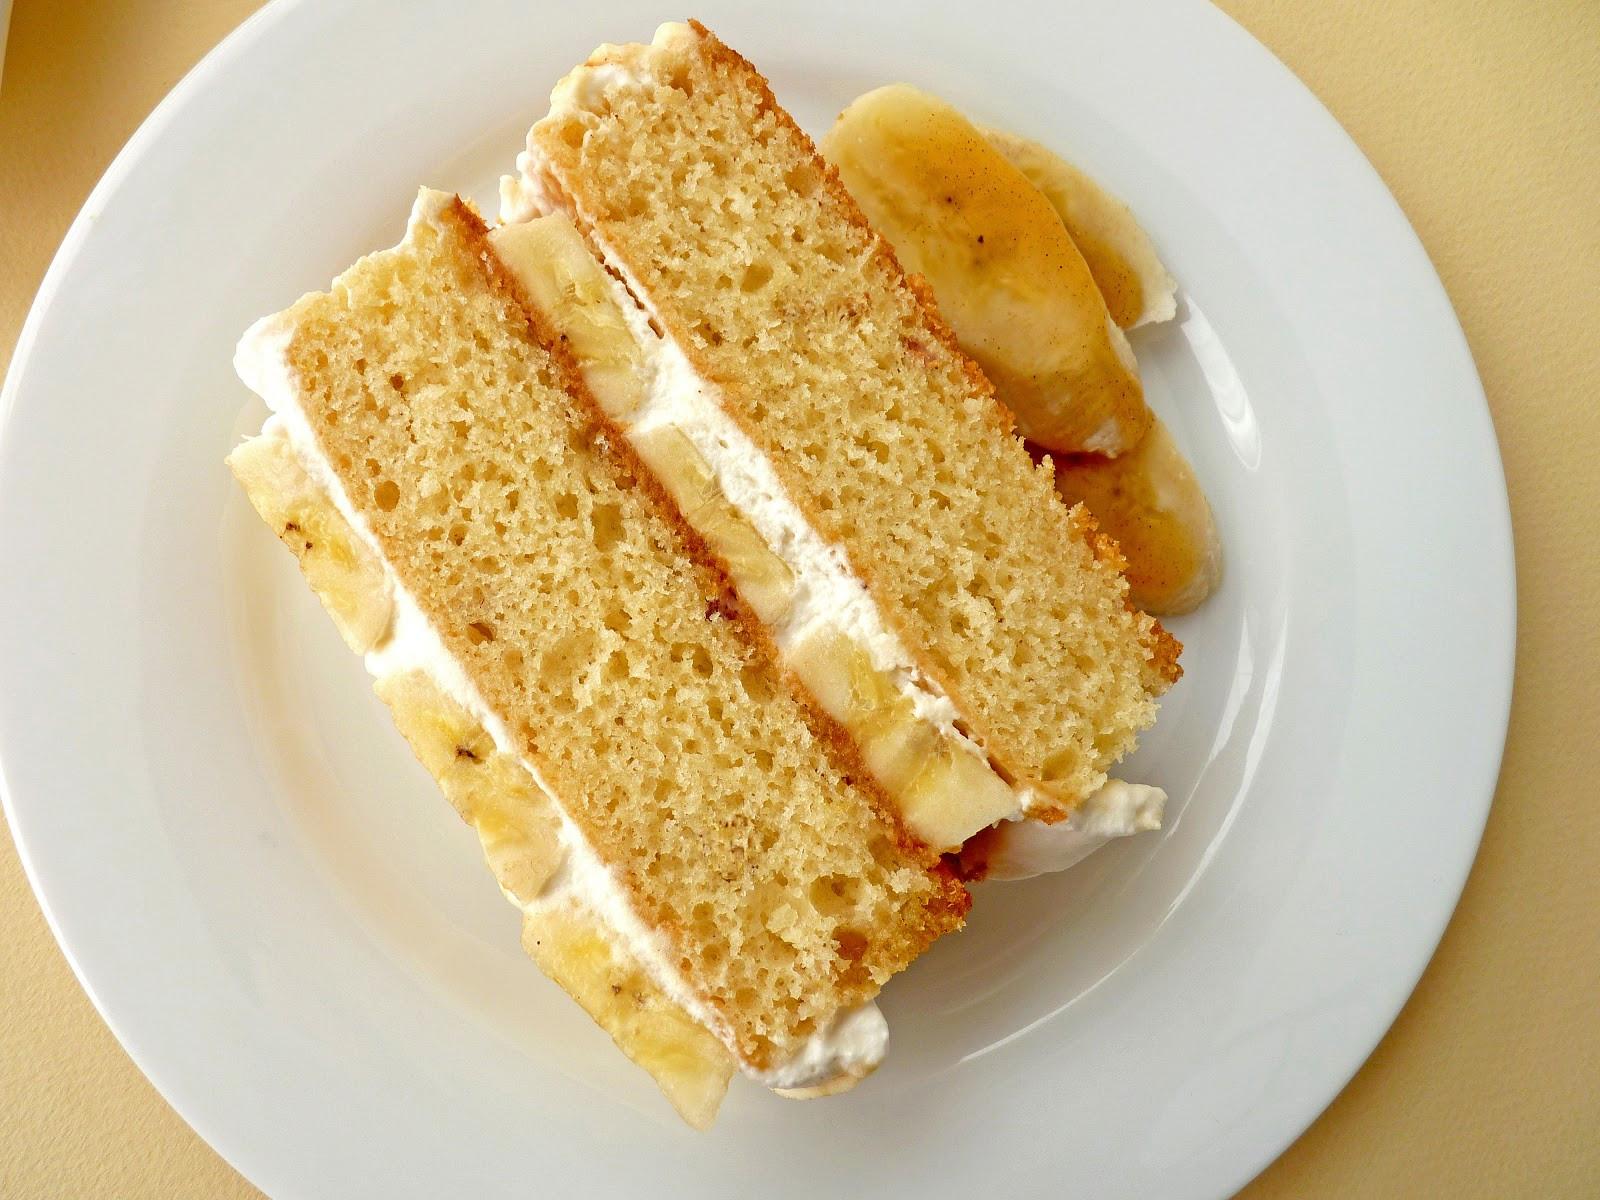 Banana Cream Cake  pastry studio Banana Cream Cake with Cinnamon Caramel Syrup